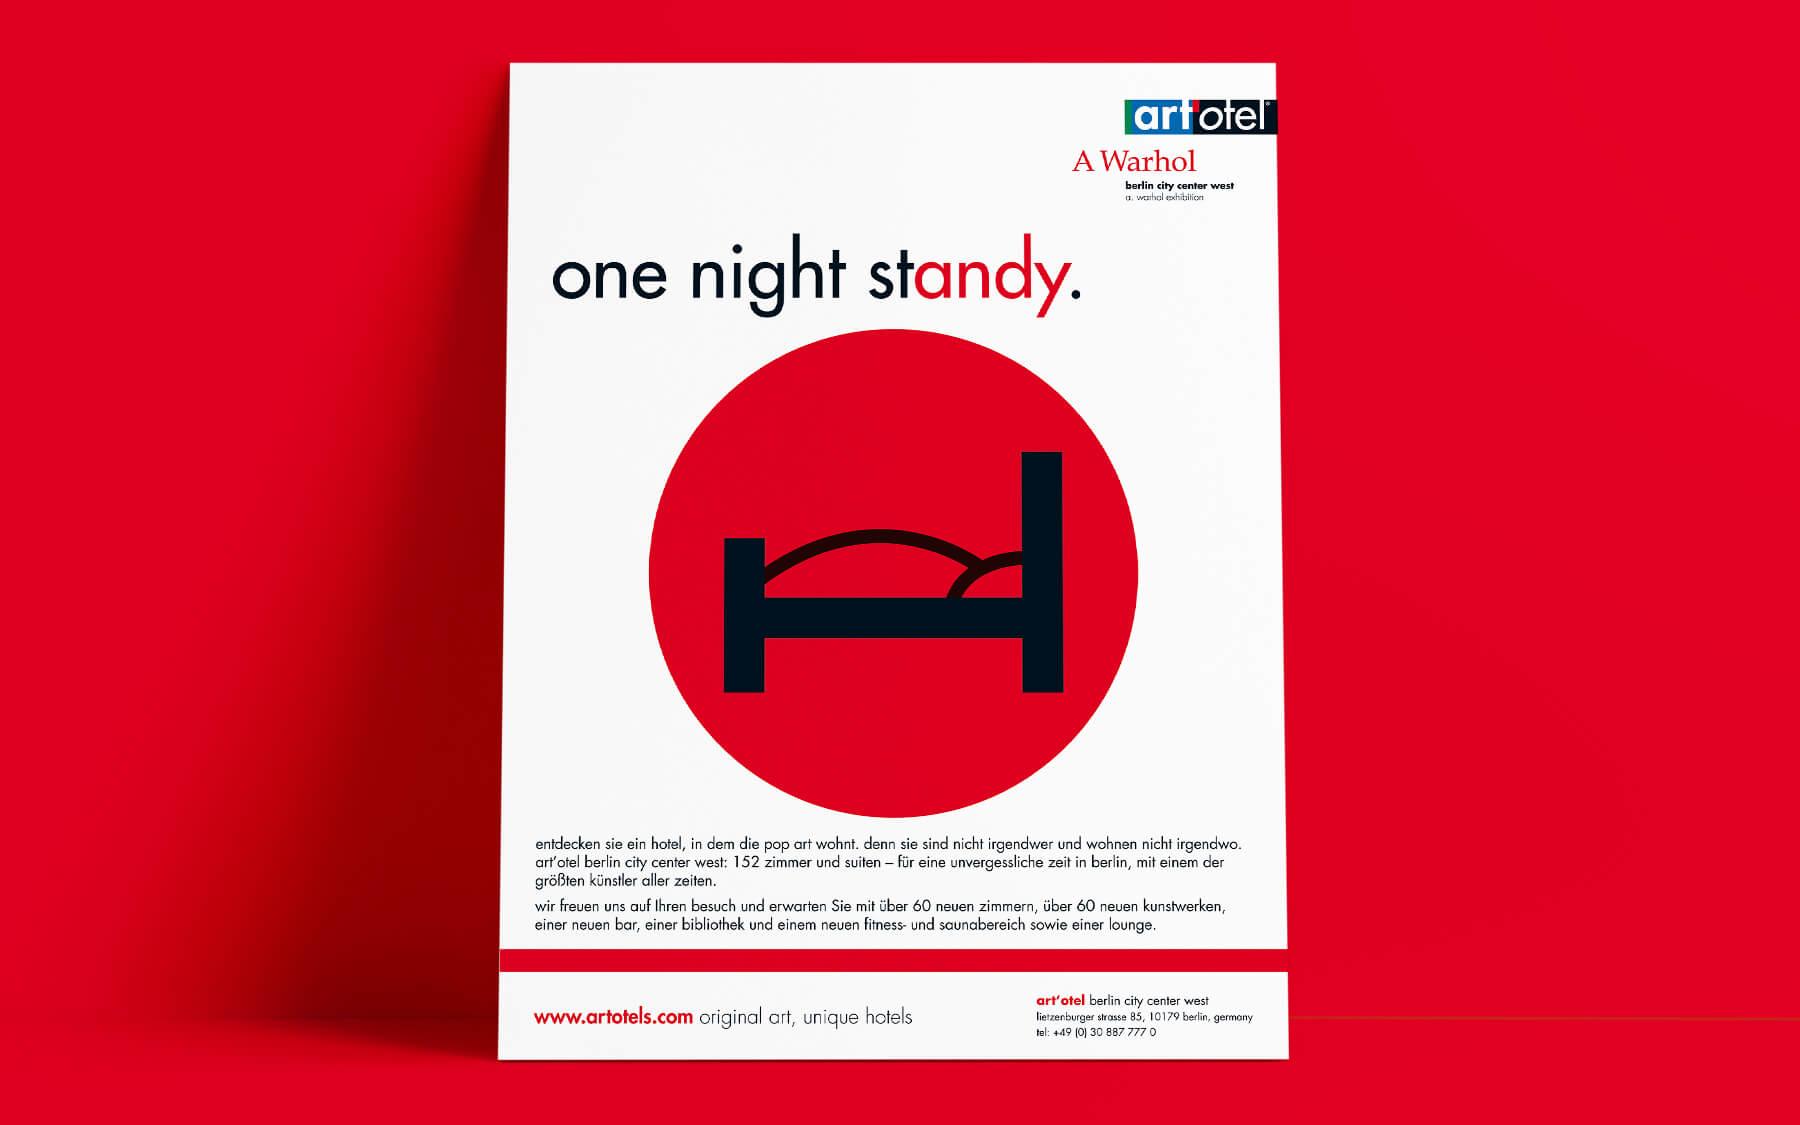 kreativagentur berlin creativ ideenschmiede factory werbeagentur berlin sued art hotel otel one night stand